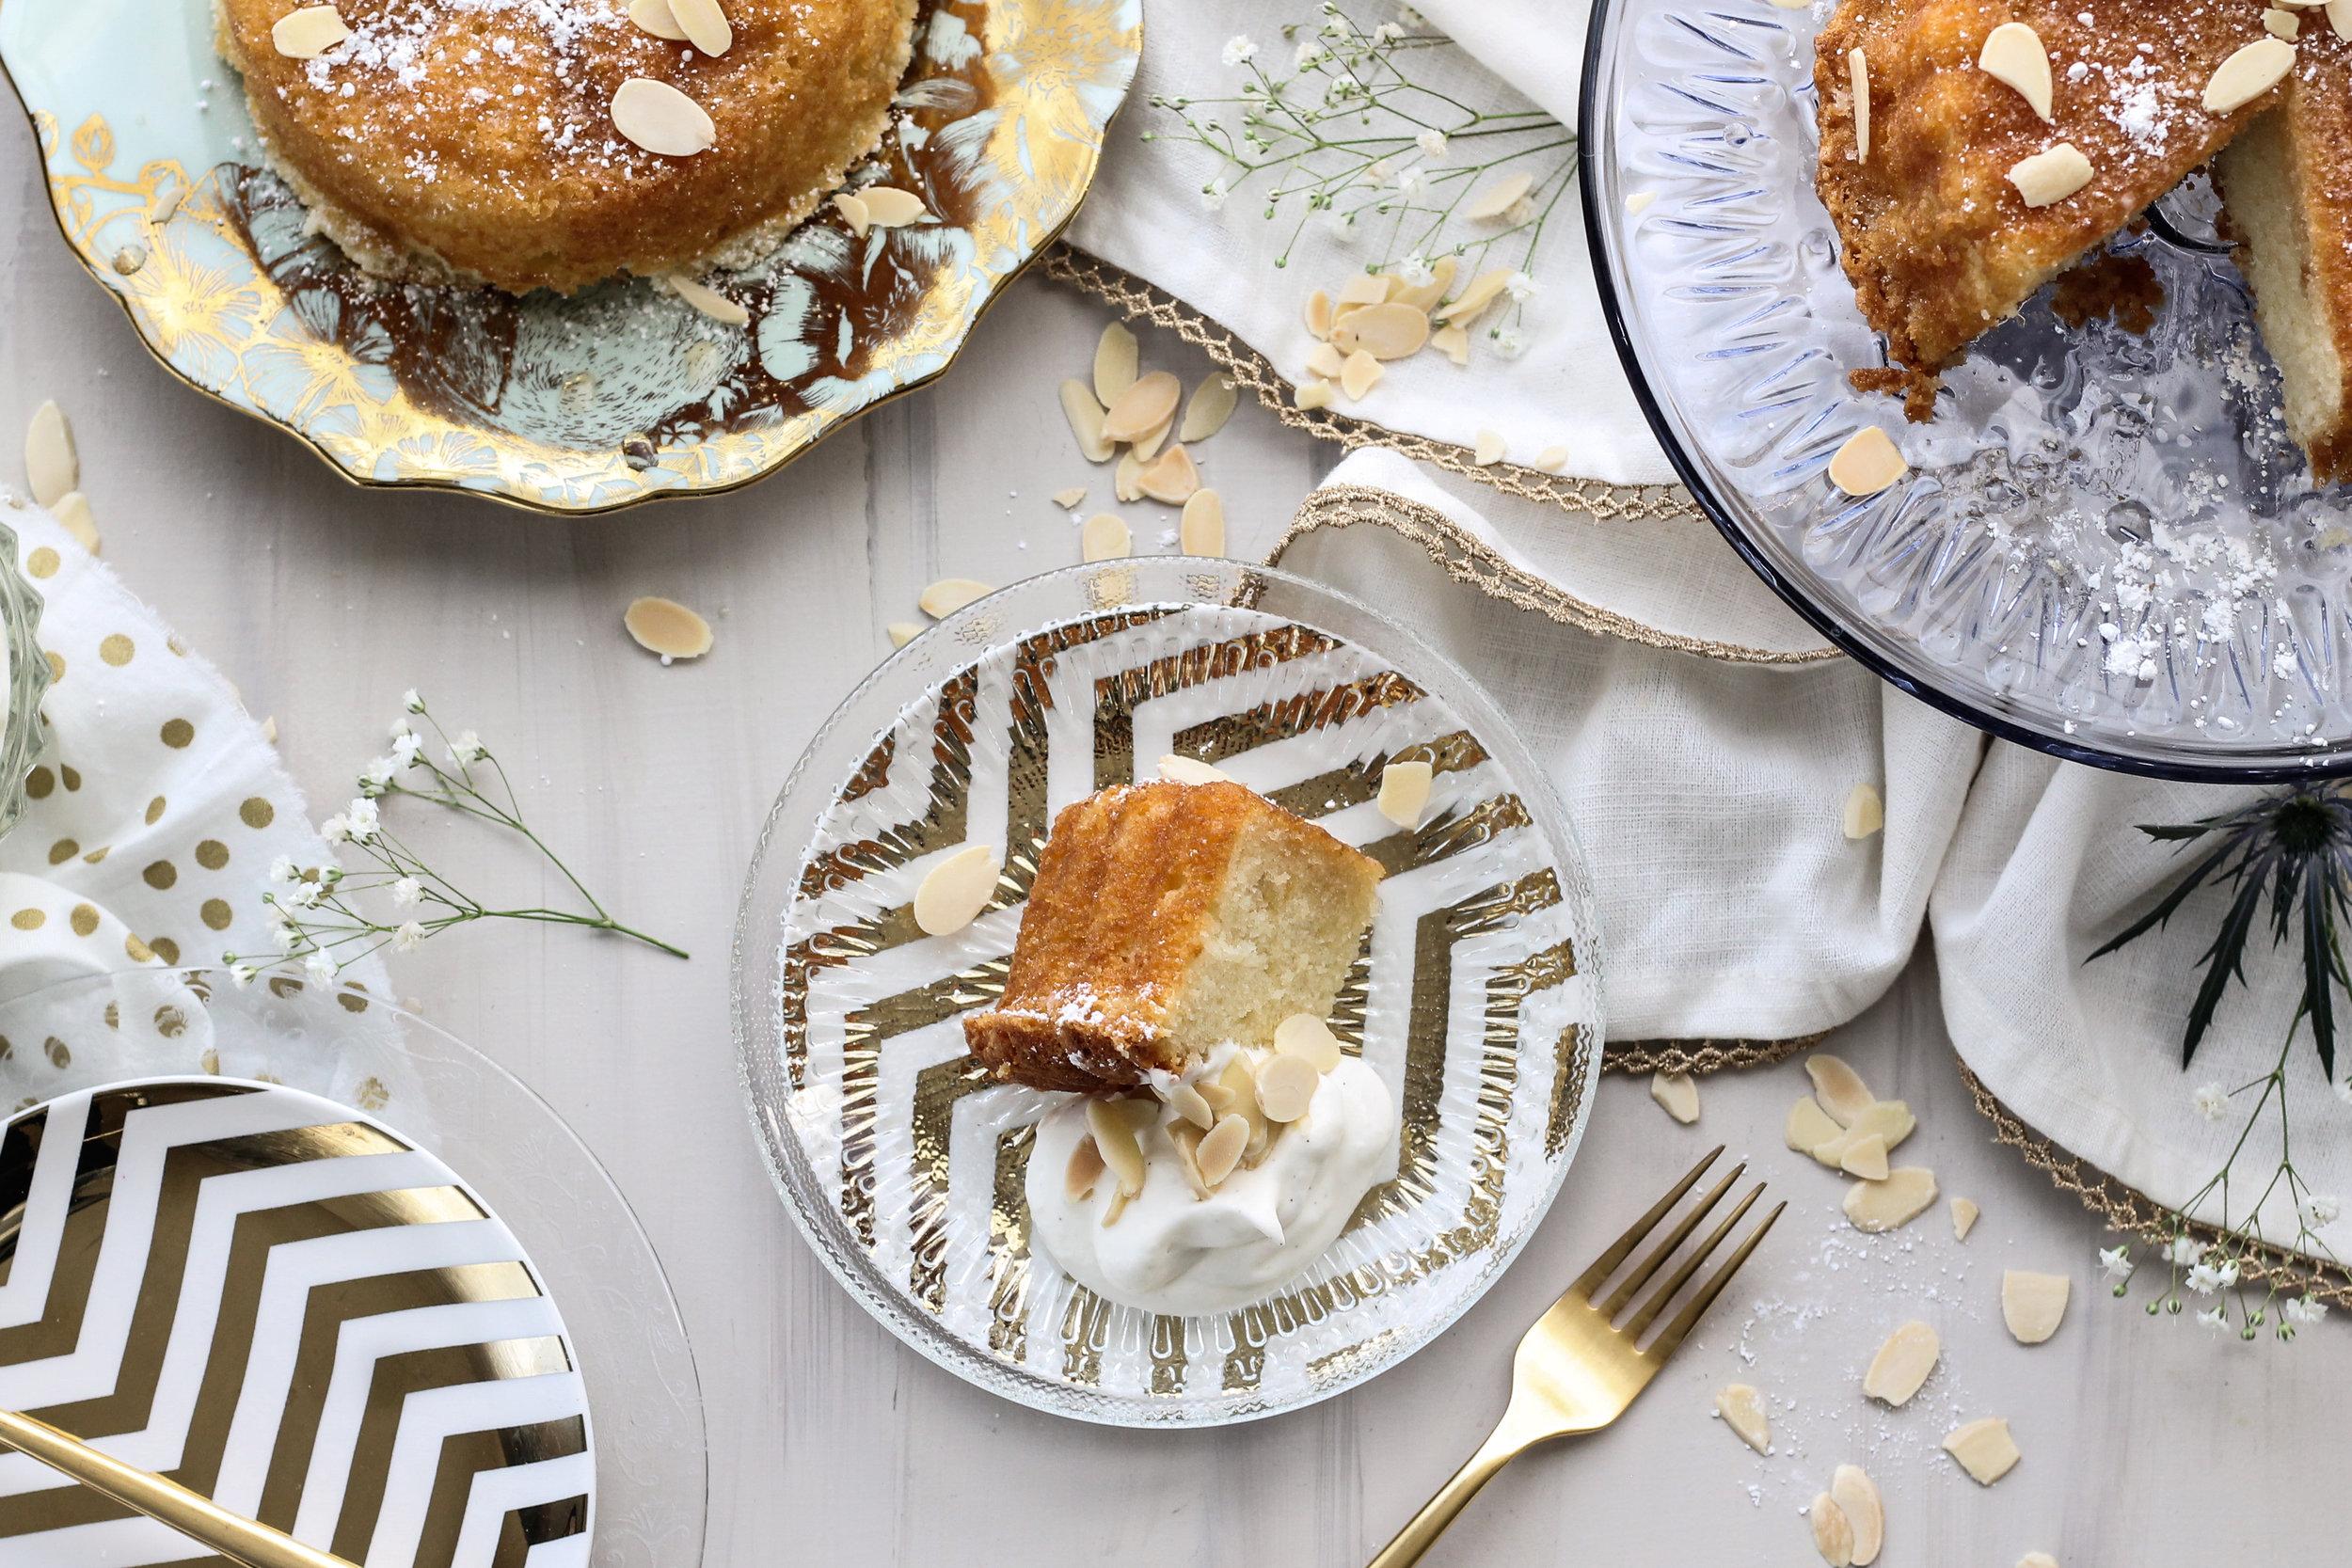 IMG_4011.jpgMiniature Almond Amaretto Cakes [ www.pedanticfoodie.com ]